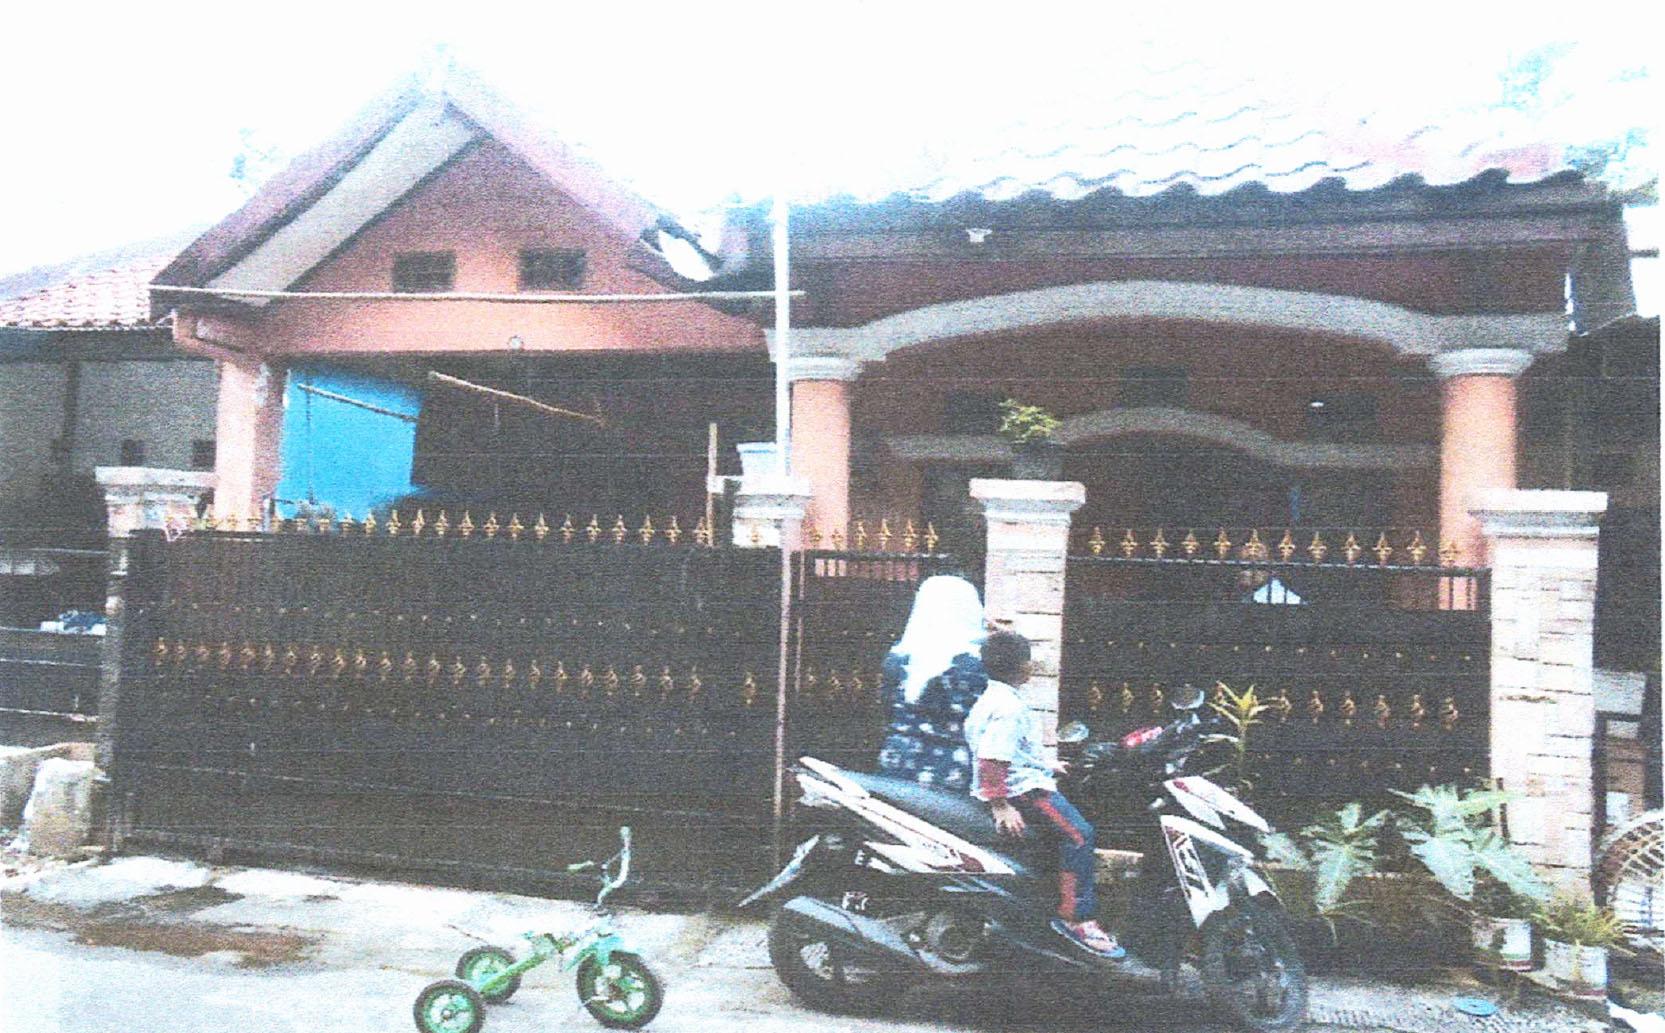 Dilelang Sebidang tanah seluas 78 m 2 berikut bangunan (Rumah) di Bekasi